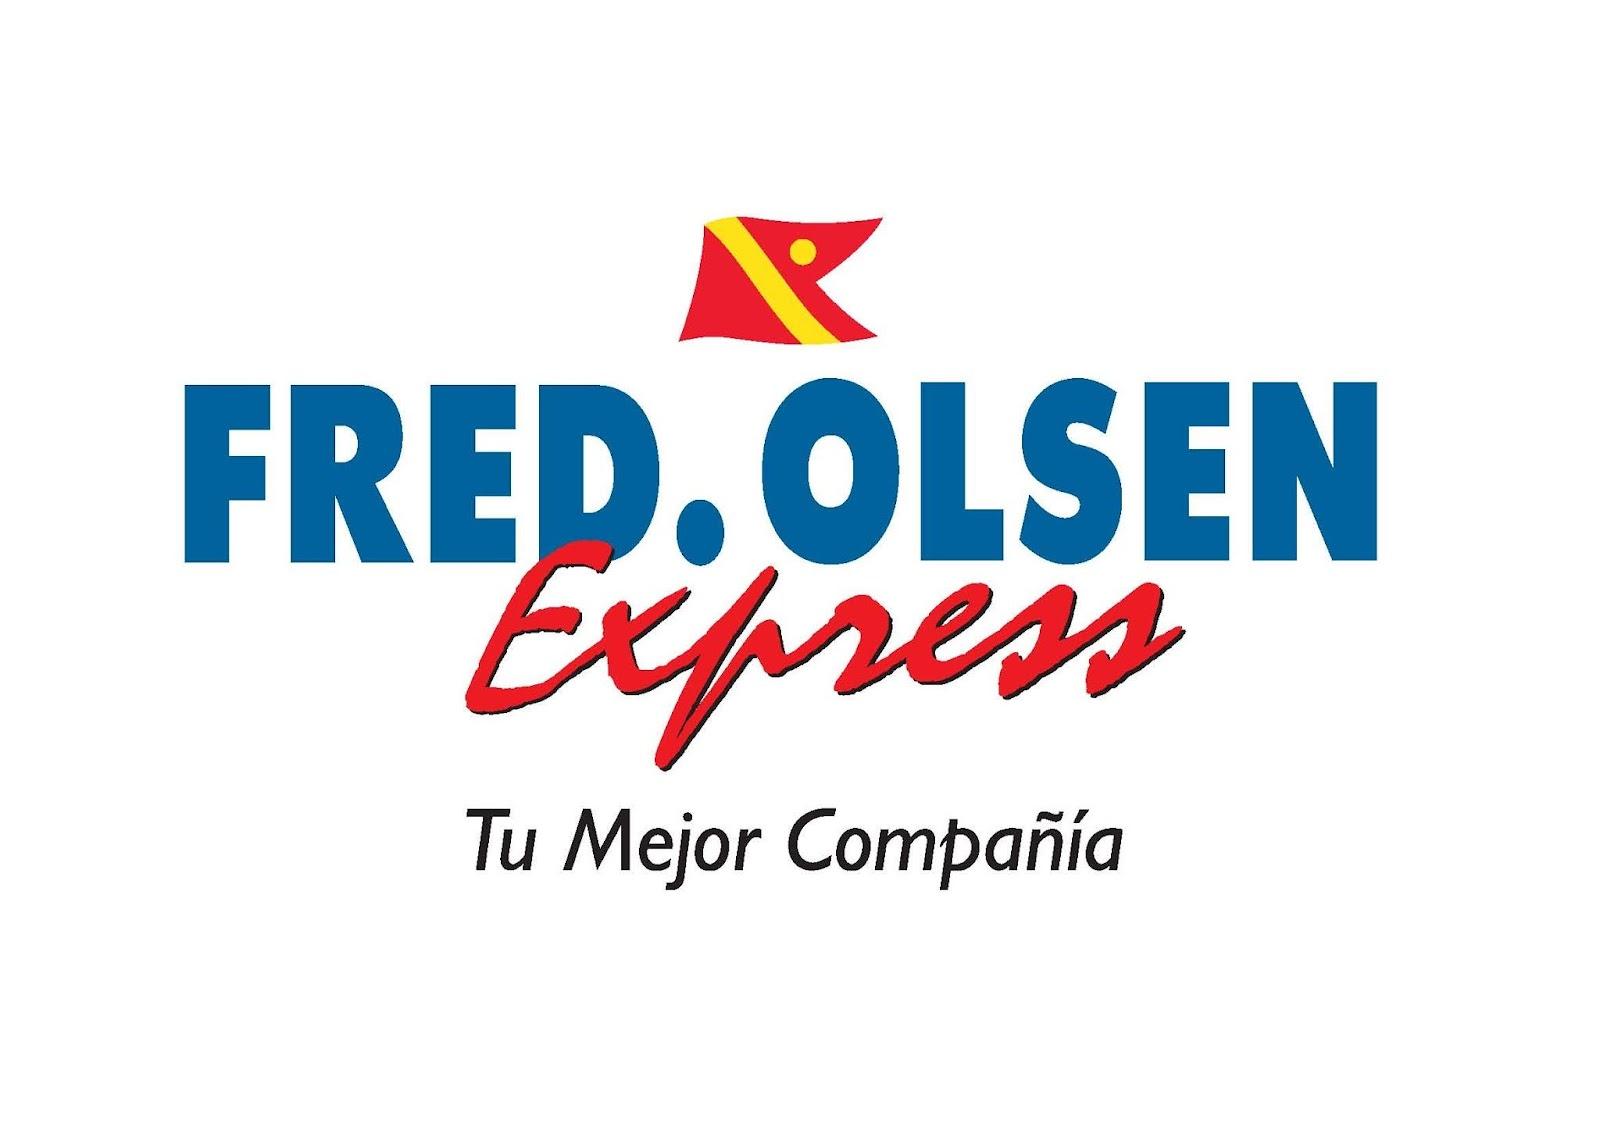 FRED OLSEN_logo vertical nuevo.jpg